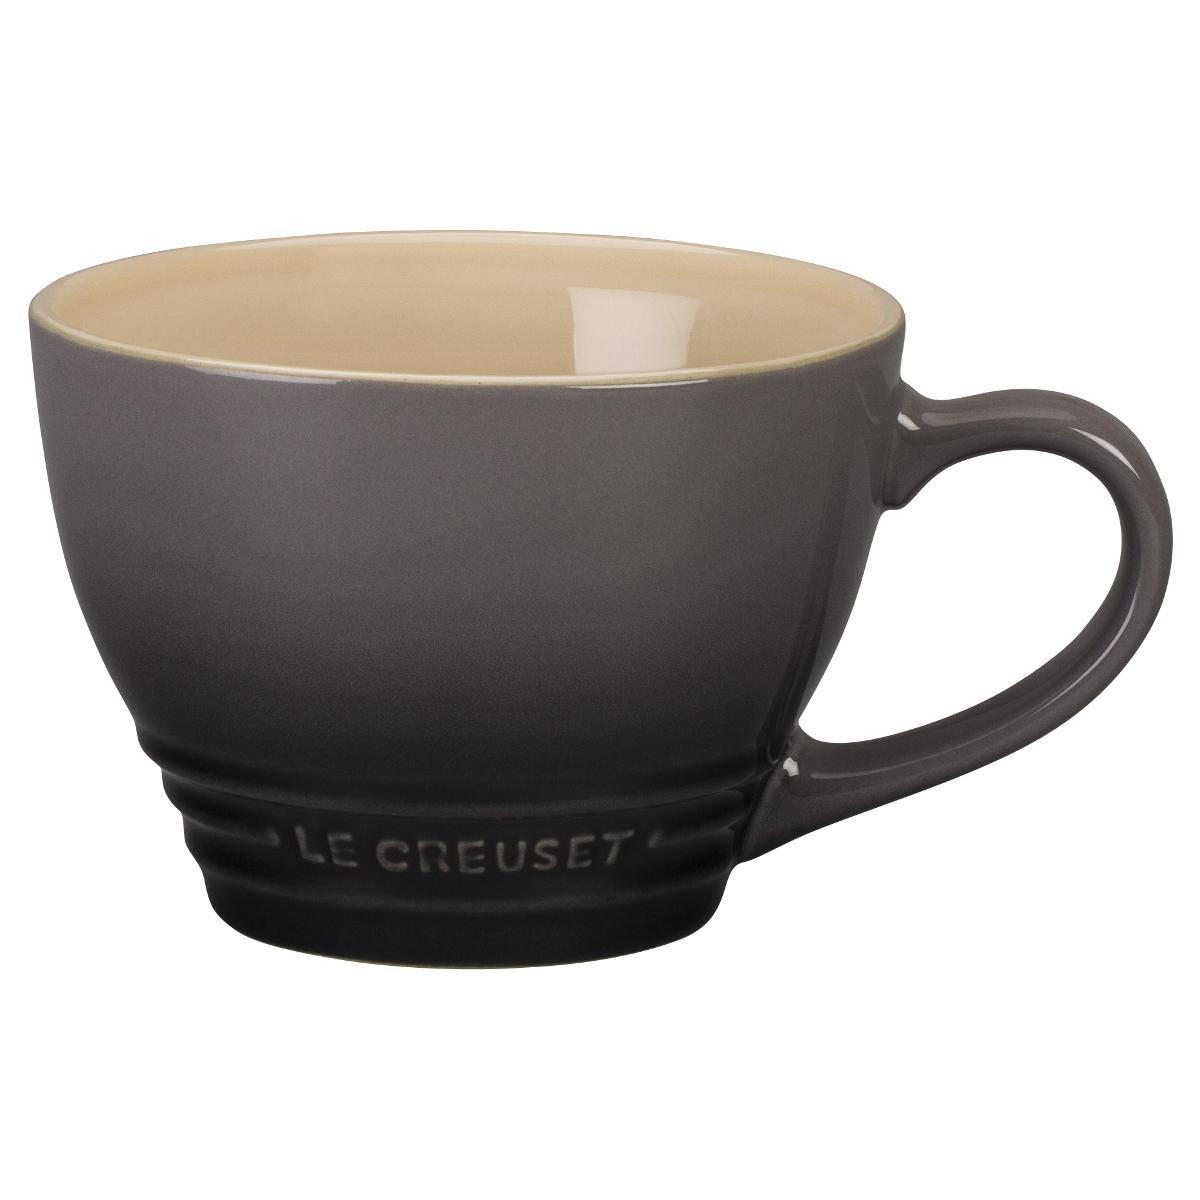 Le Creuset Oyster Stoneware 14 Ounce Bistro Mug